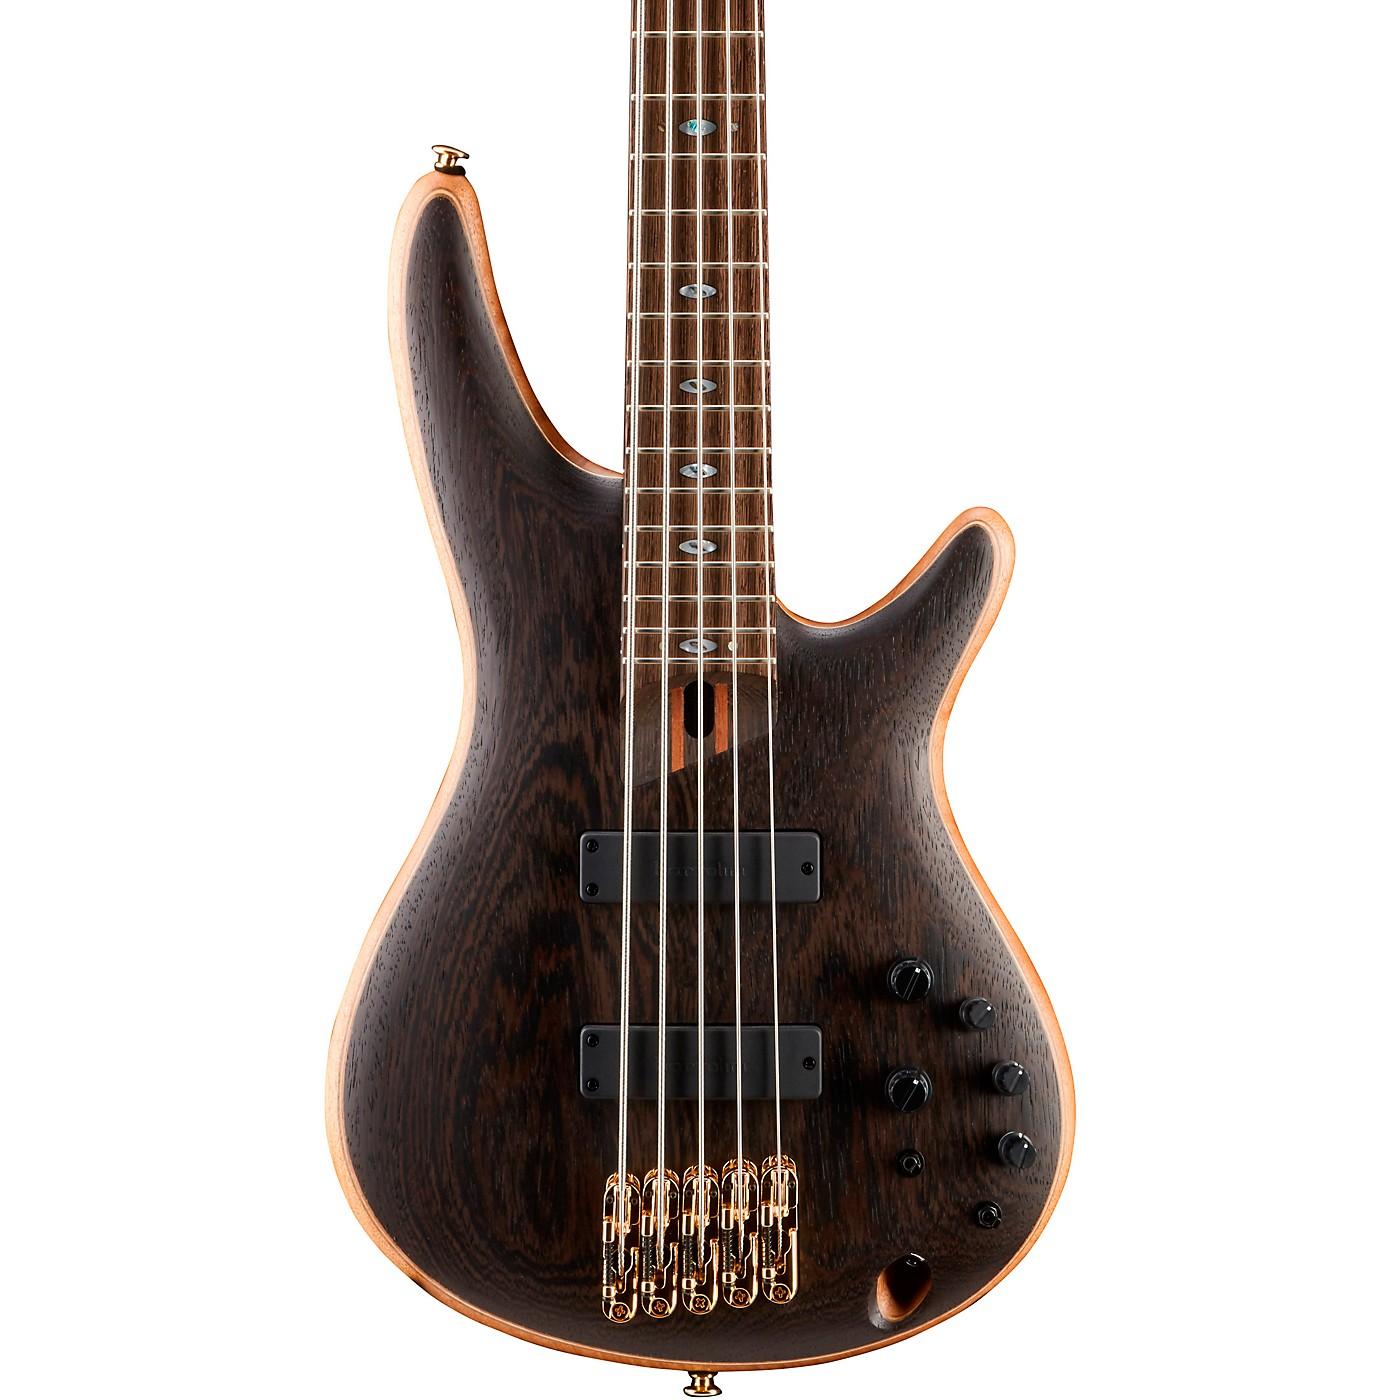 Ibanez Prestige SR5005 5-String Electric Bass Guitar thumbnail